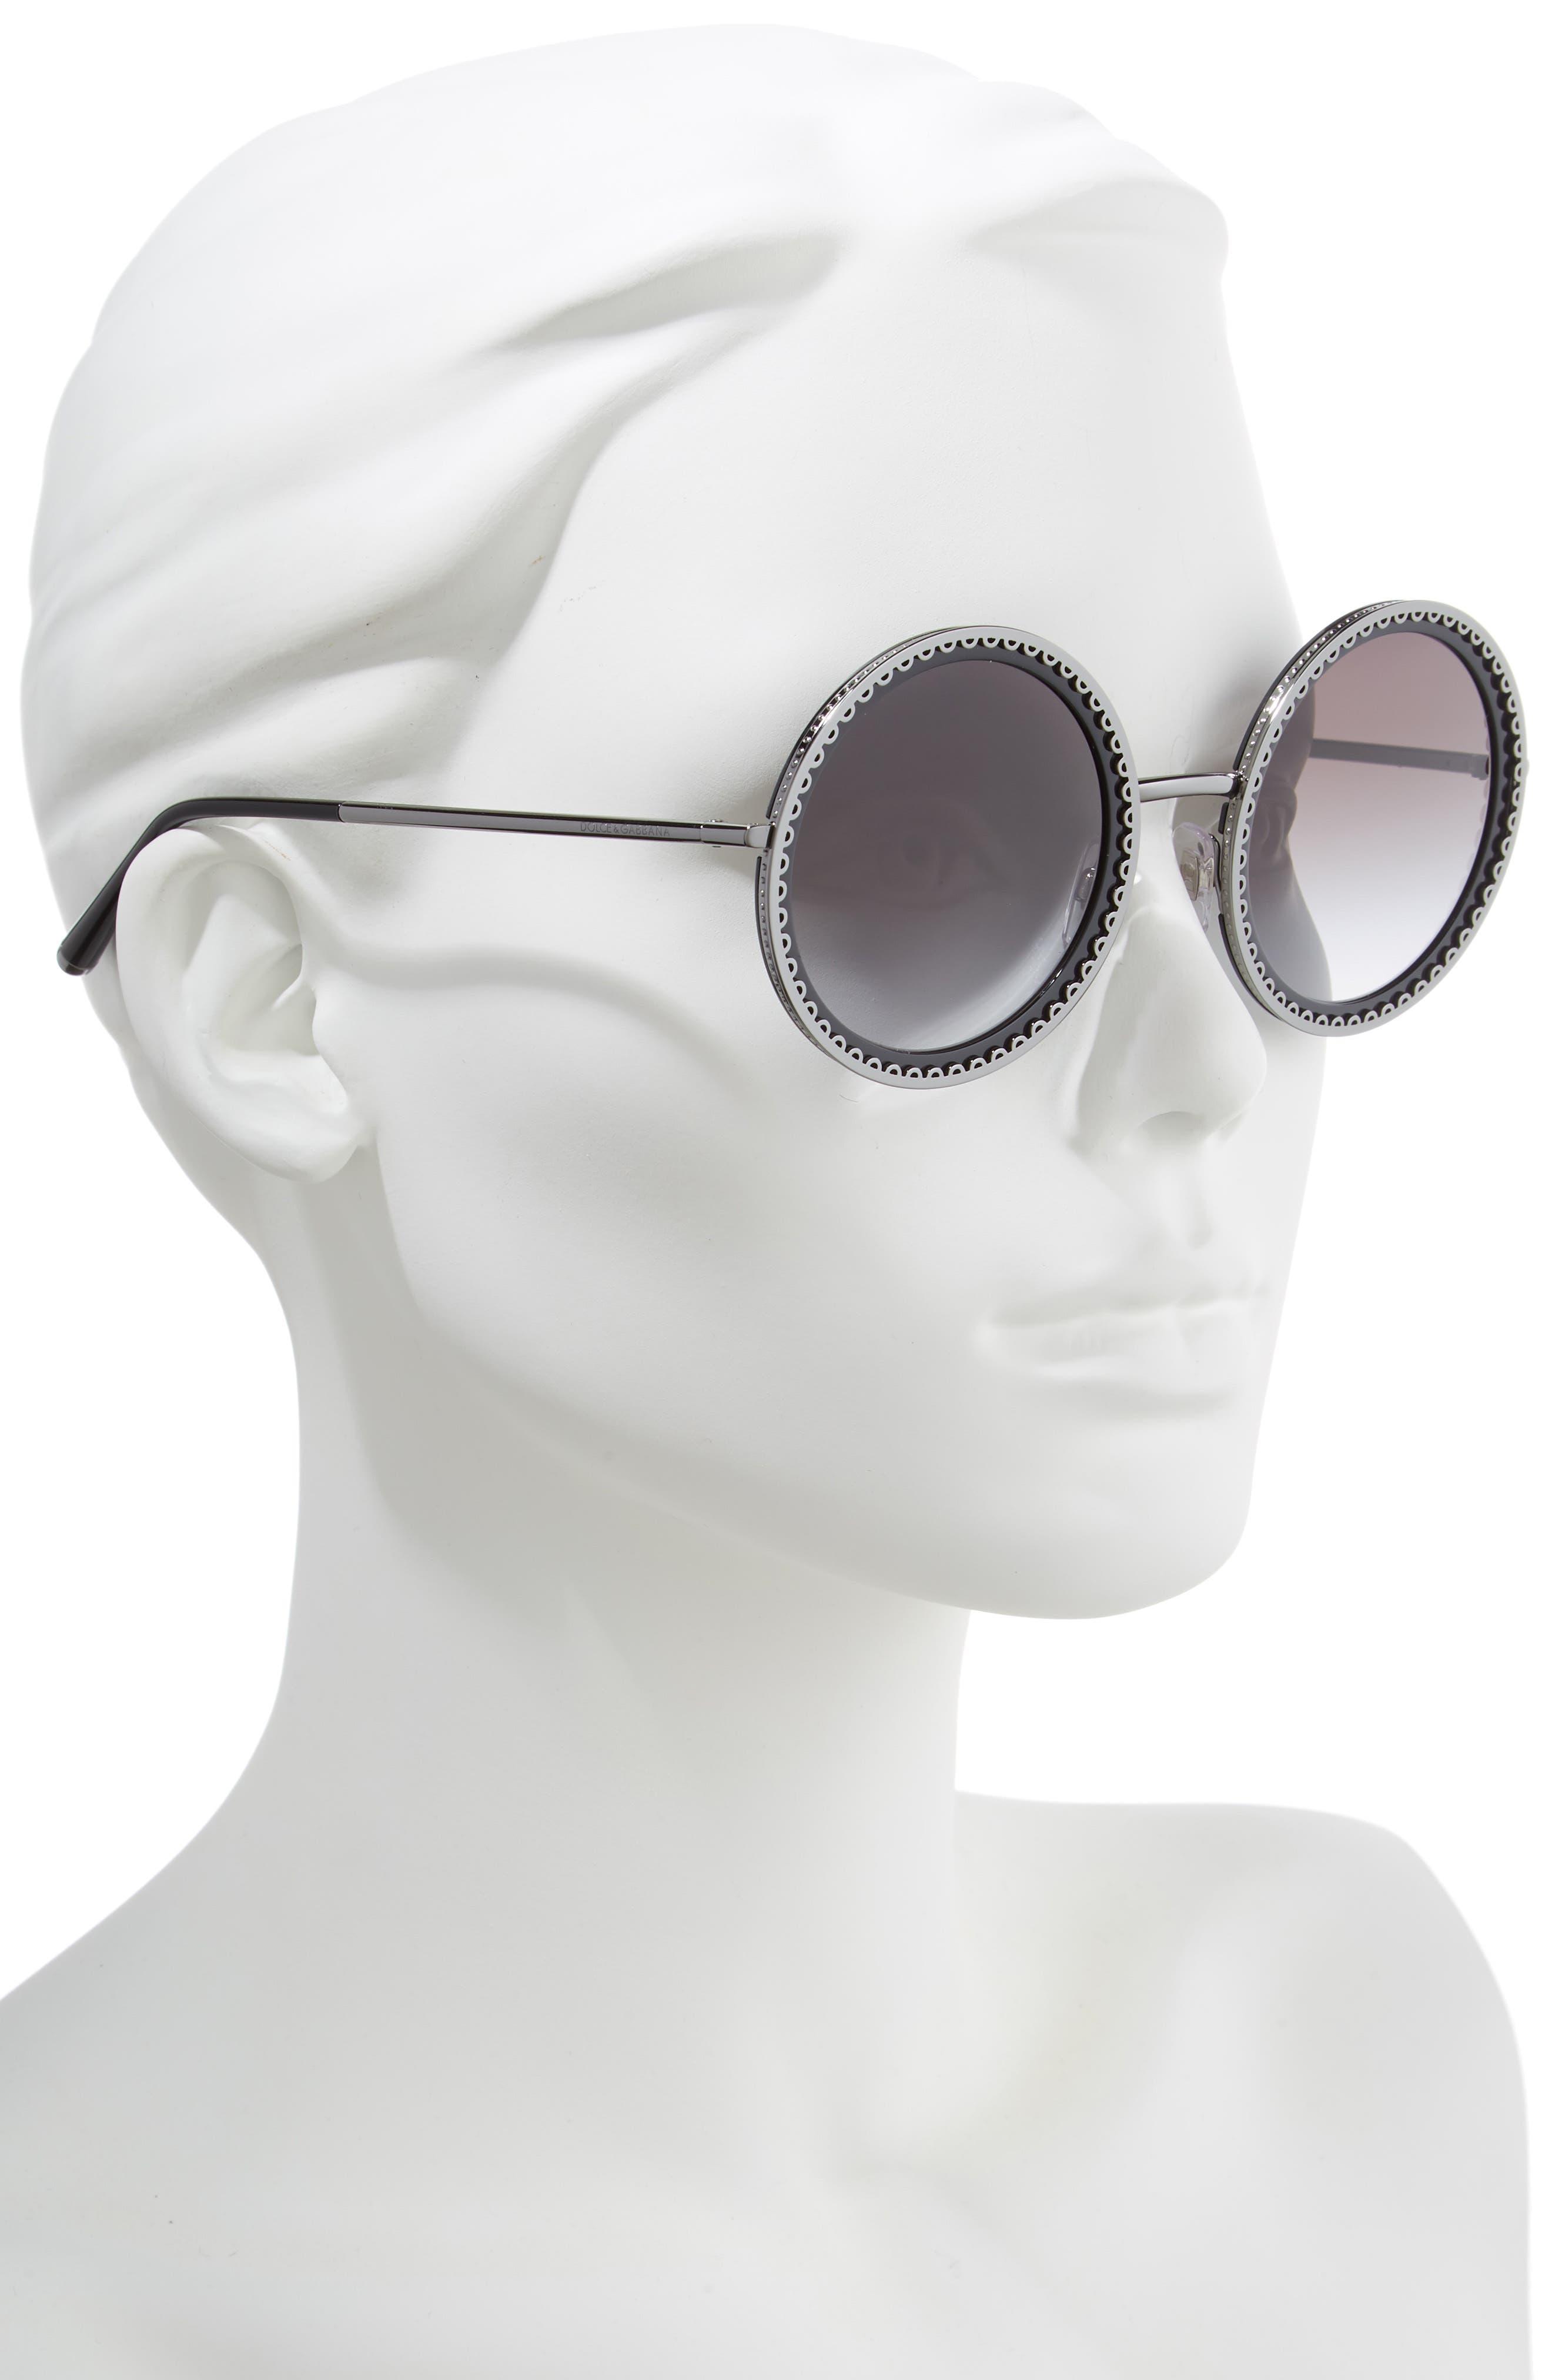 Sacred Heart 53mm Gradient Round Sunglasses,                             Alternate thumbnail 2, color,                             DARK GUNMETAL GRADIENT